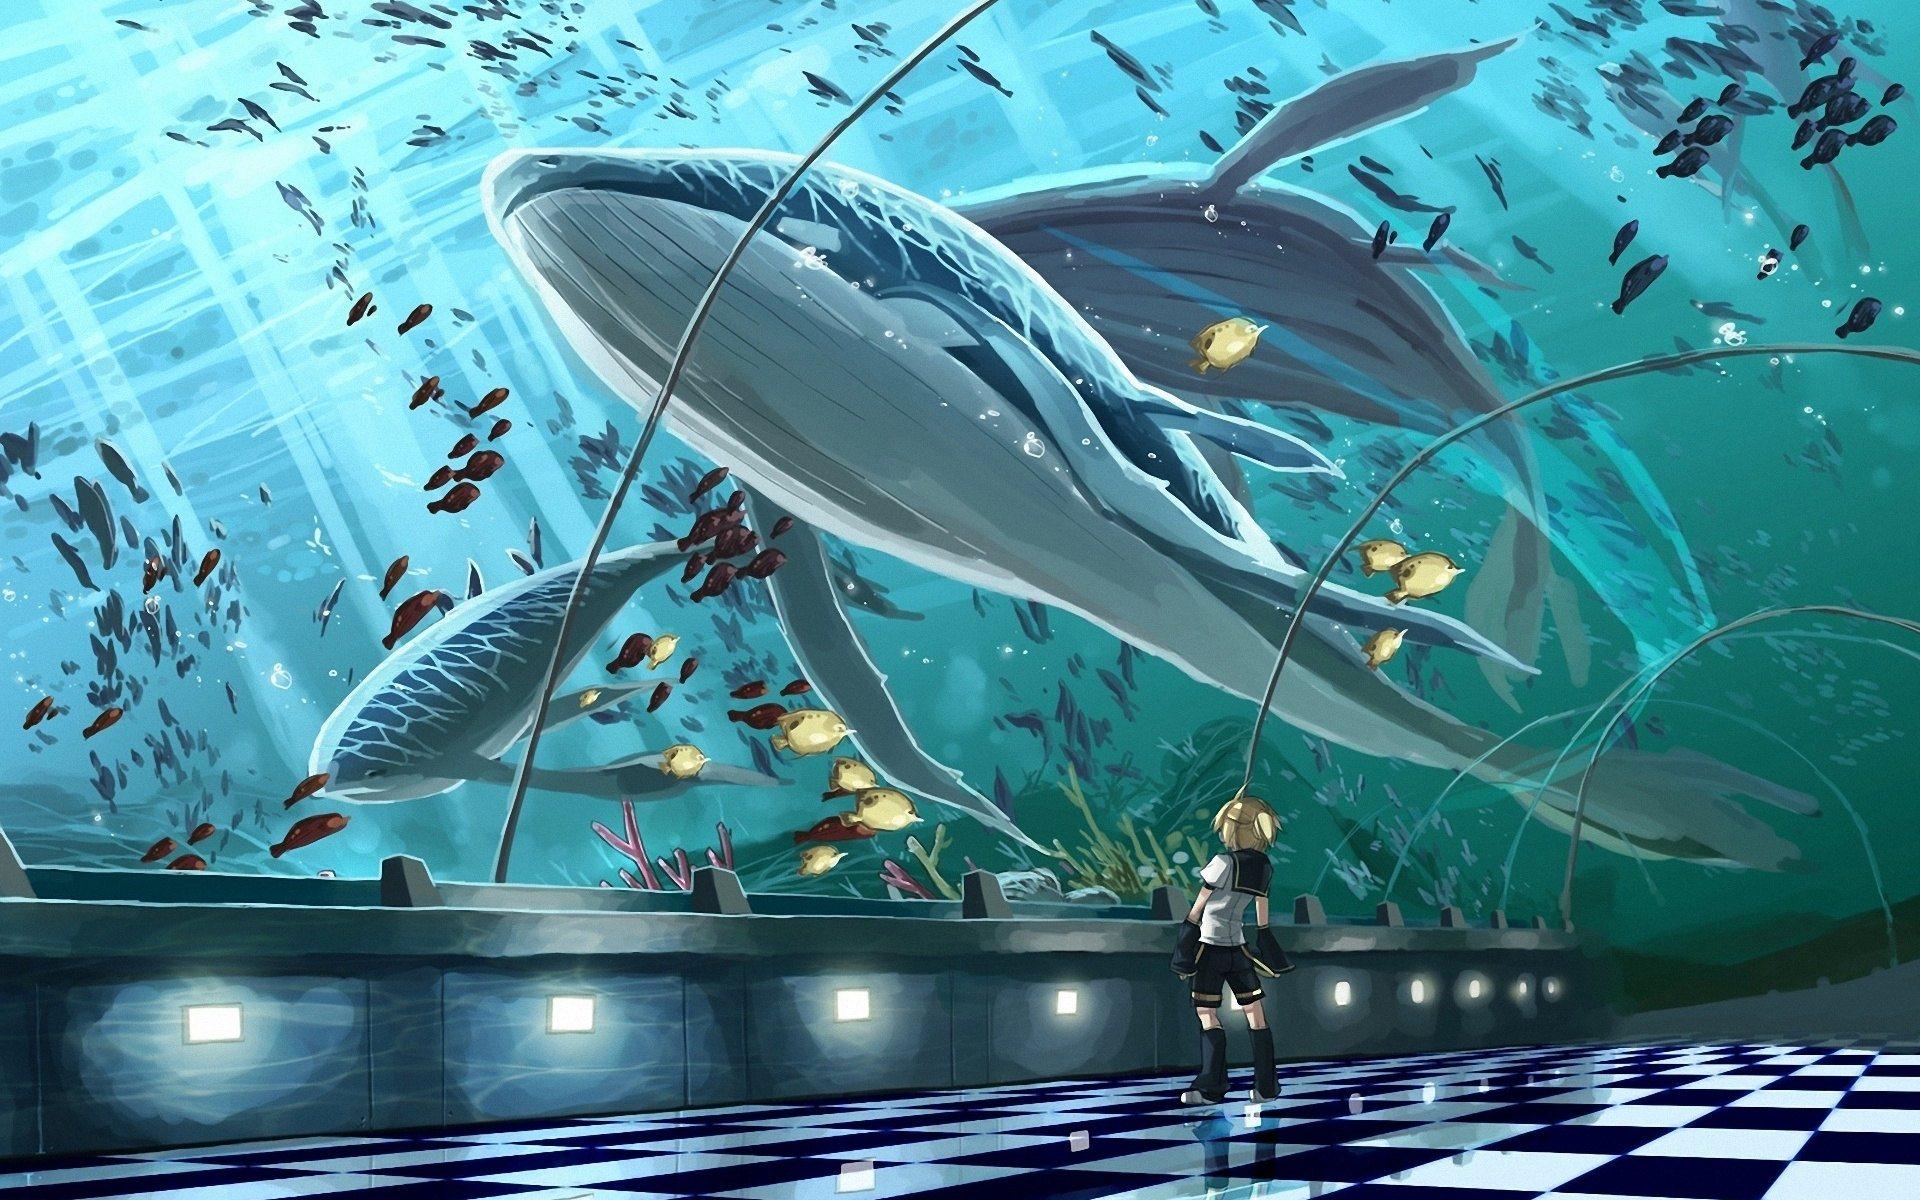 Wallpaper Hd Animes Juntos: Wallpaper: Anime HD Wallpapers